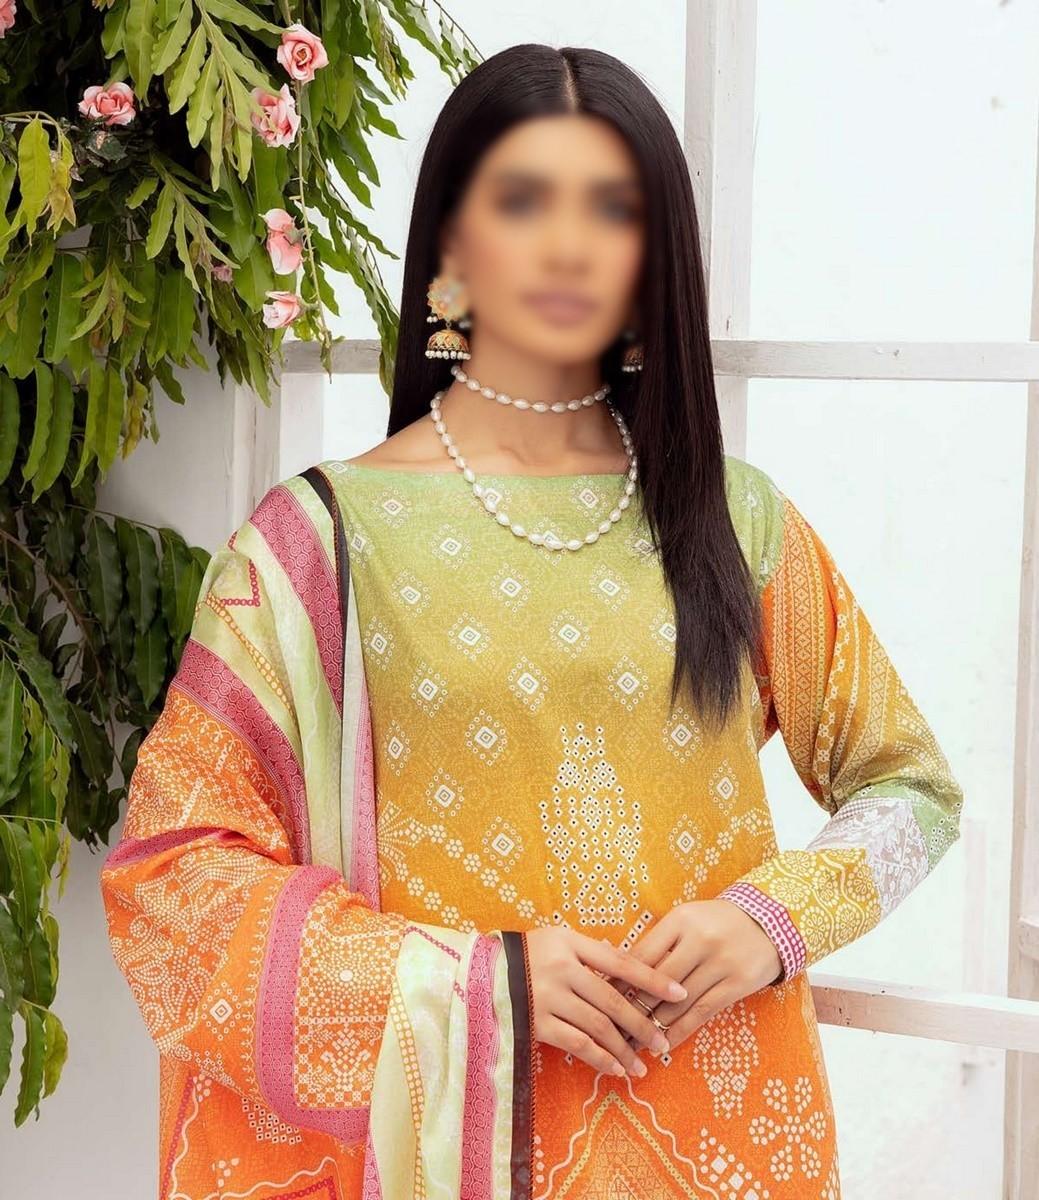 /2021/06/johra-coco-embroidered-digital-chunri-lawn-collection-d-jr-930-image3.jpeg